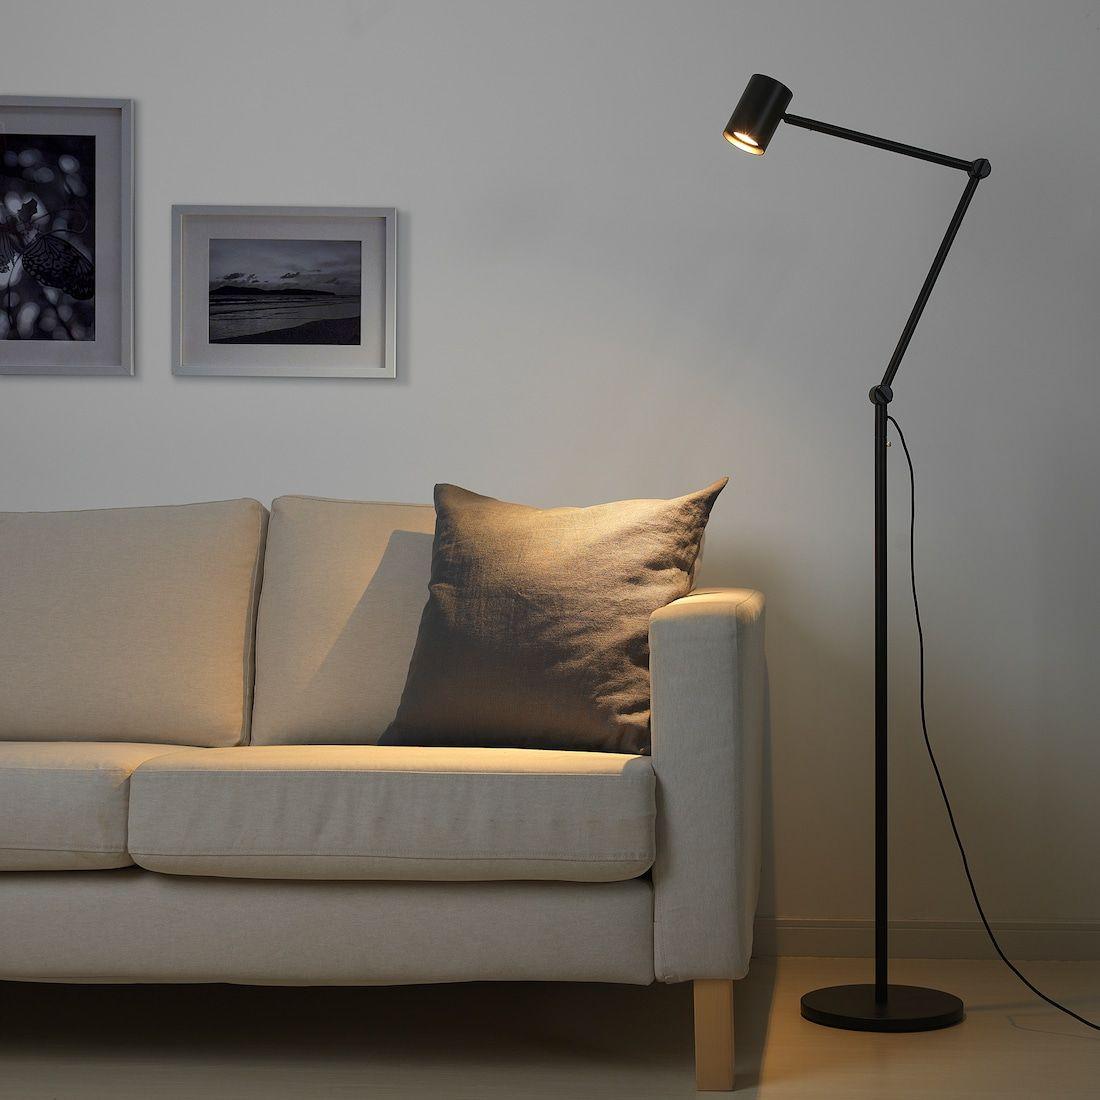 NYMÅNE Golv läslampa, antracit IKEA in 2020 | Reading